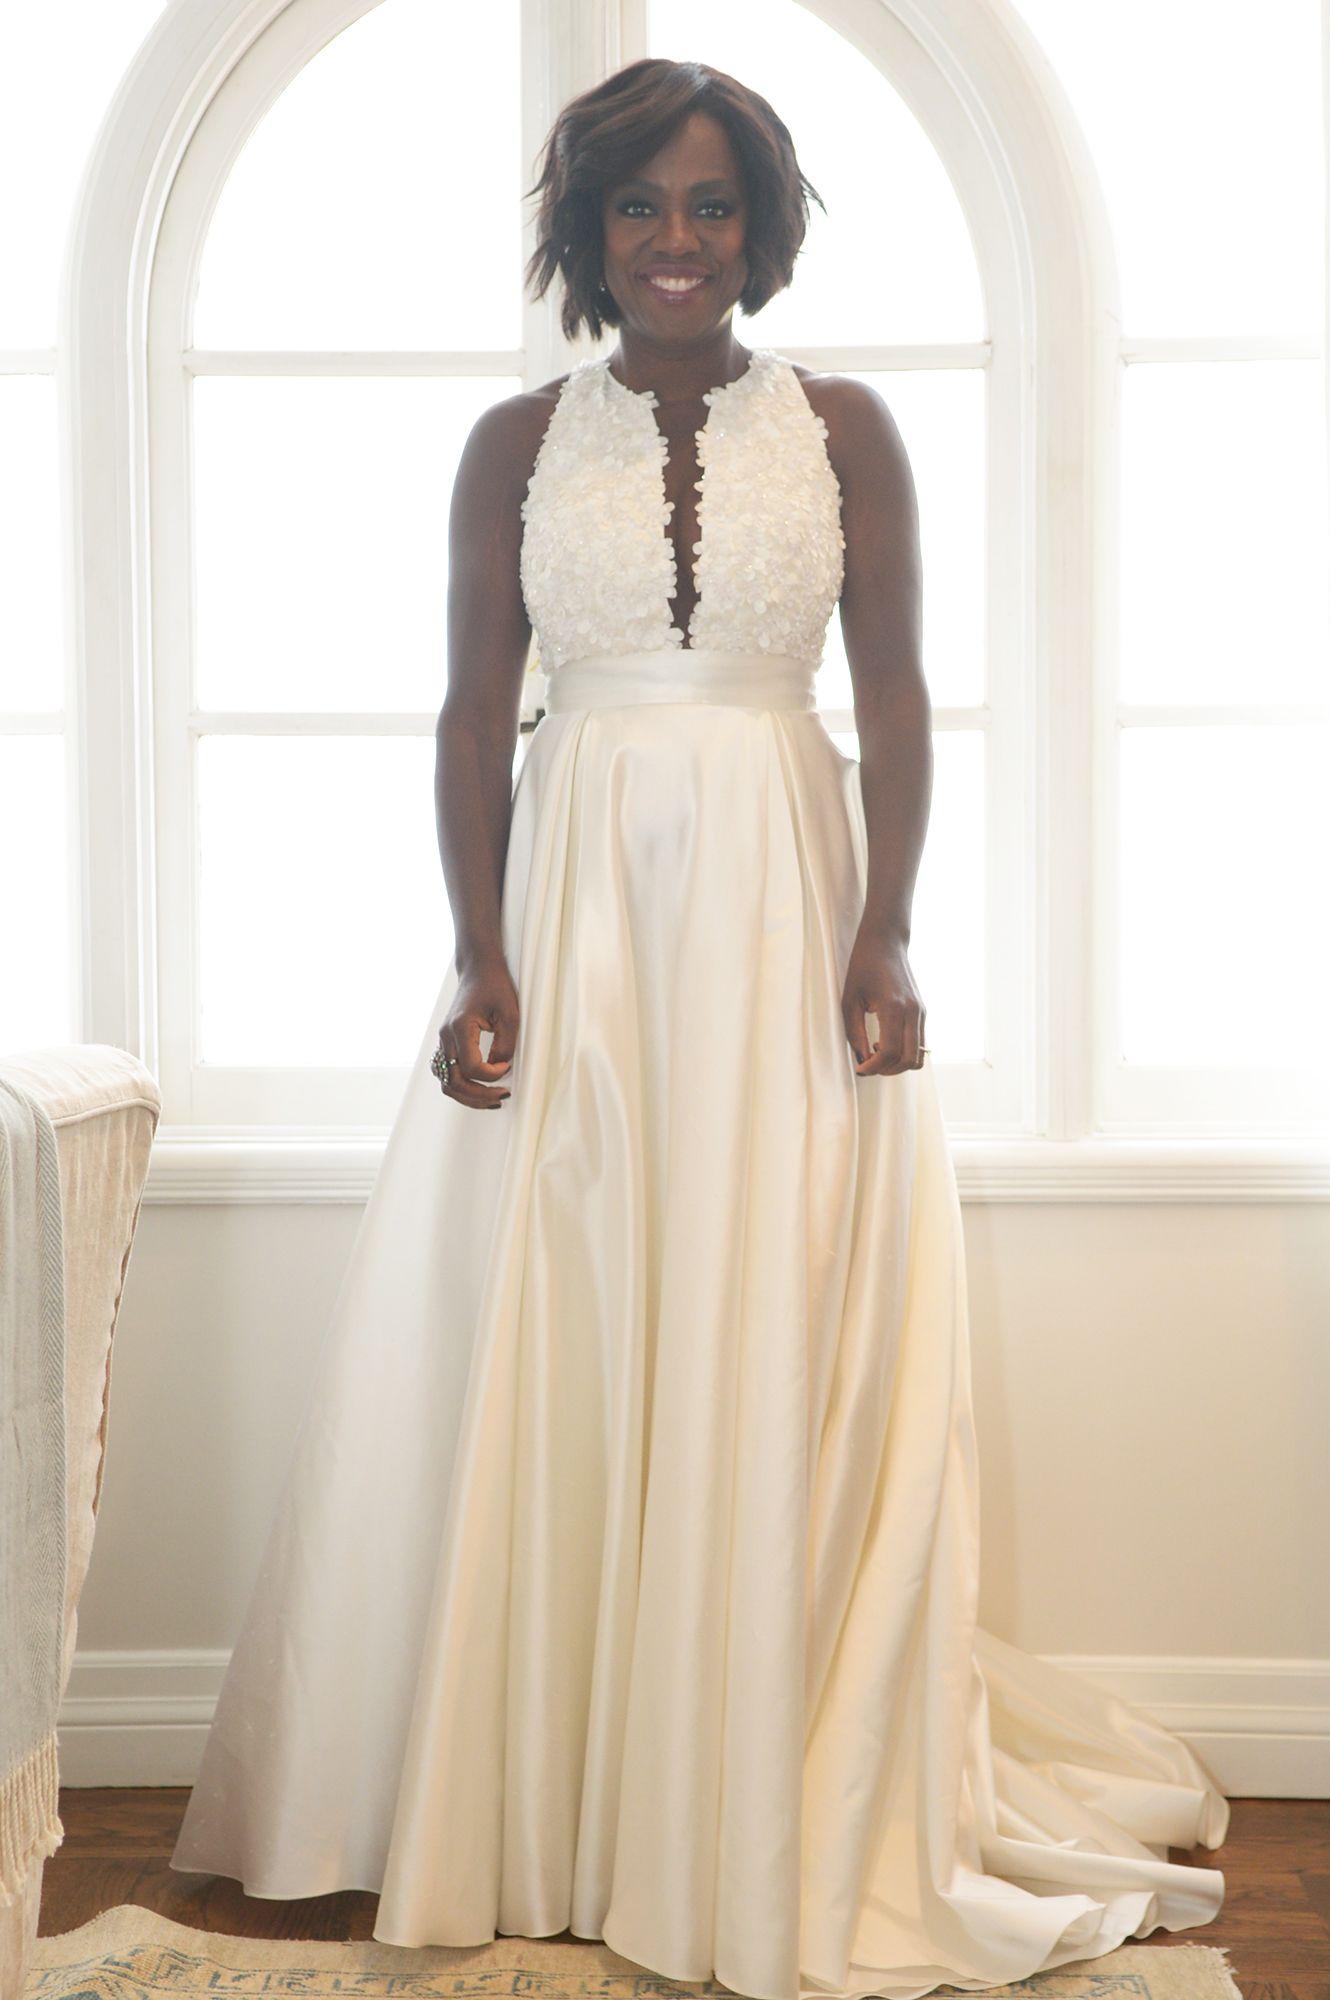 Viola Davis S Wedding Vows Renewal Look Celebrity Wedding Gowns Celebrity Weddings Viola Davis [ 2000 x 1330 Pixel ]